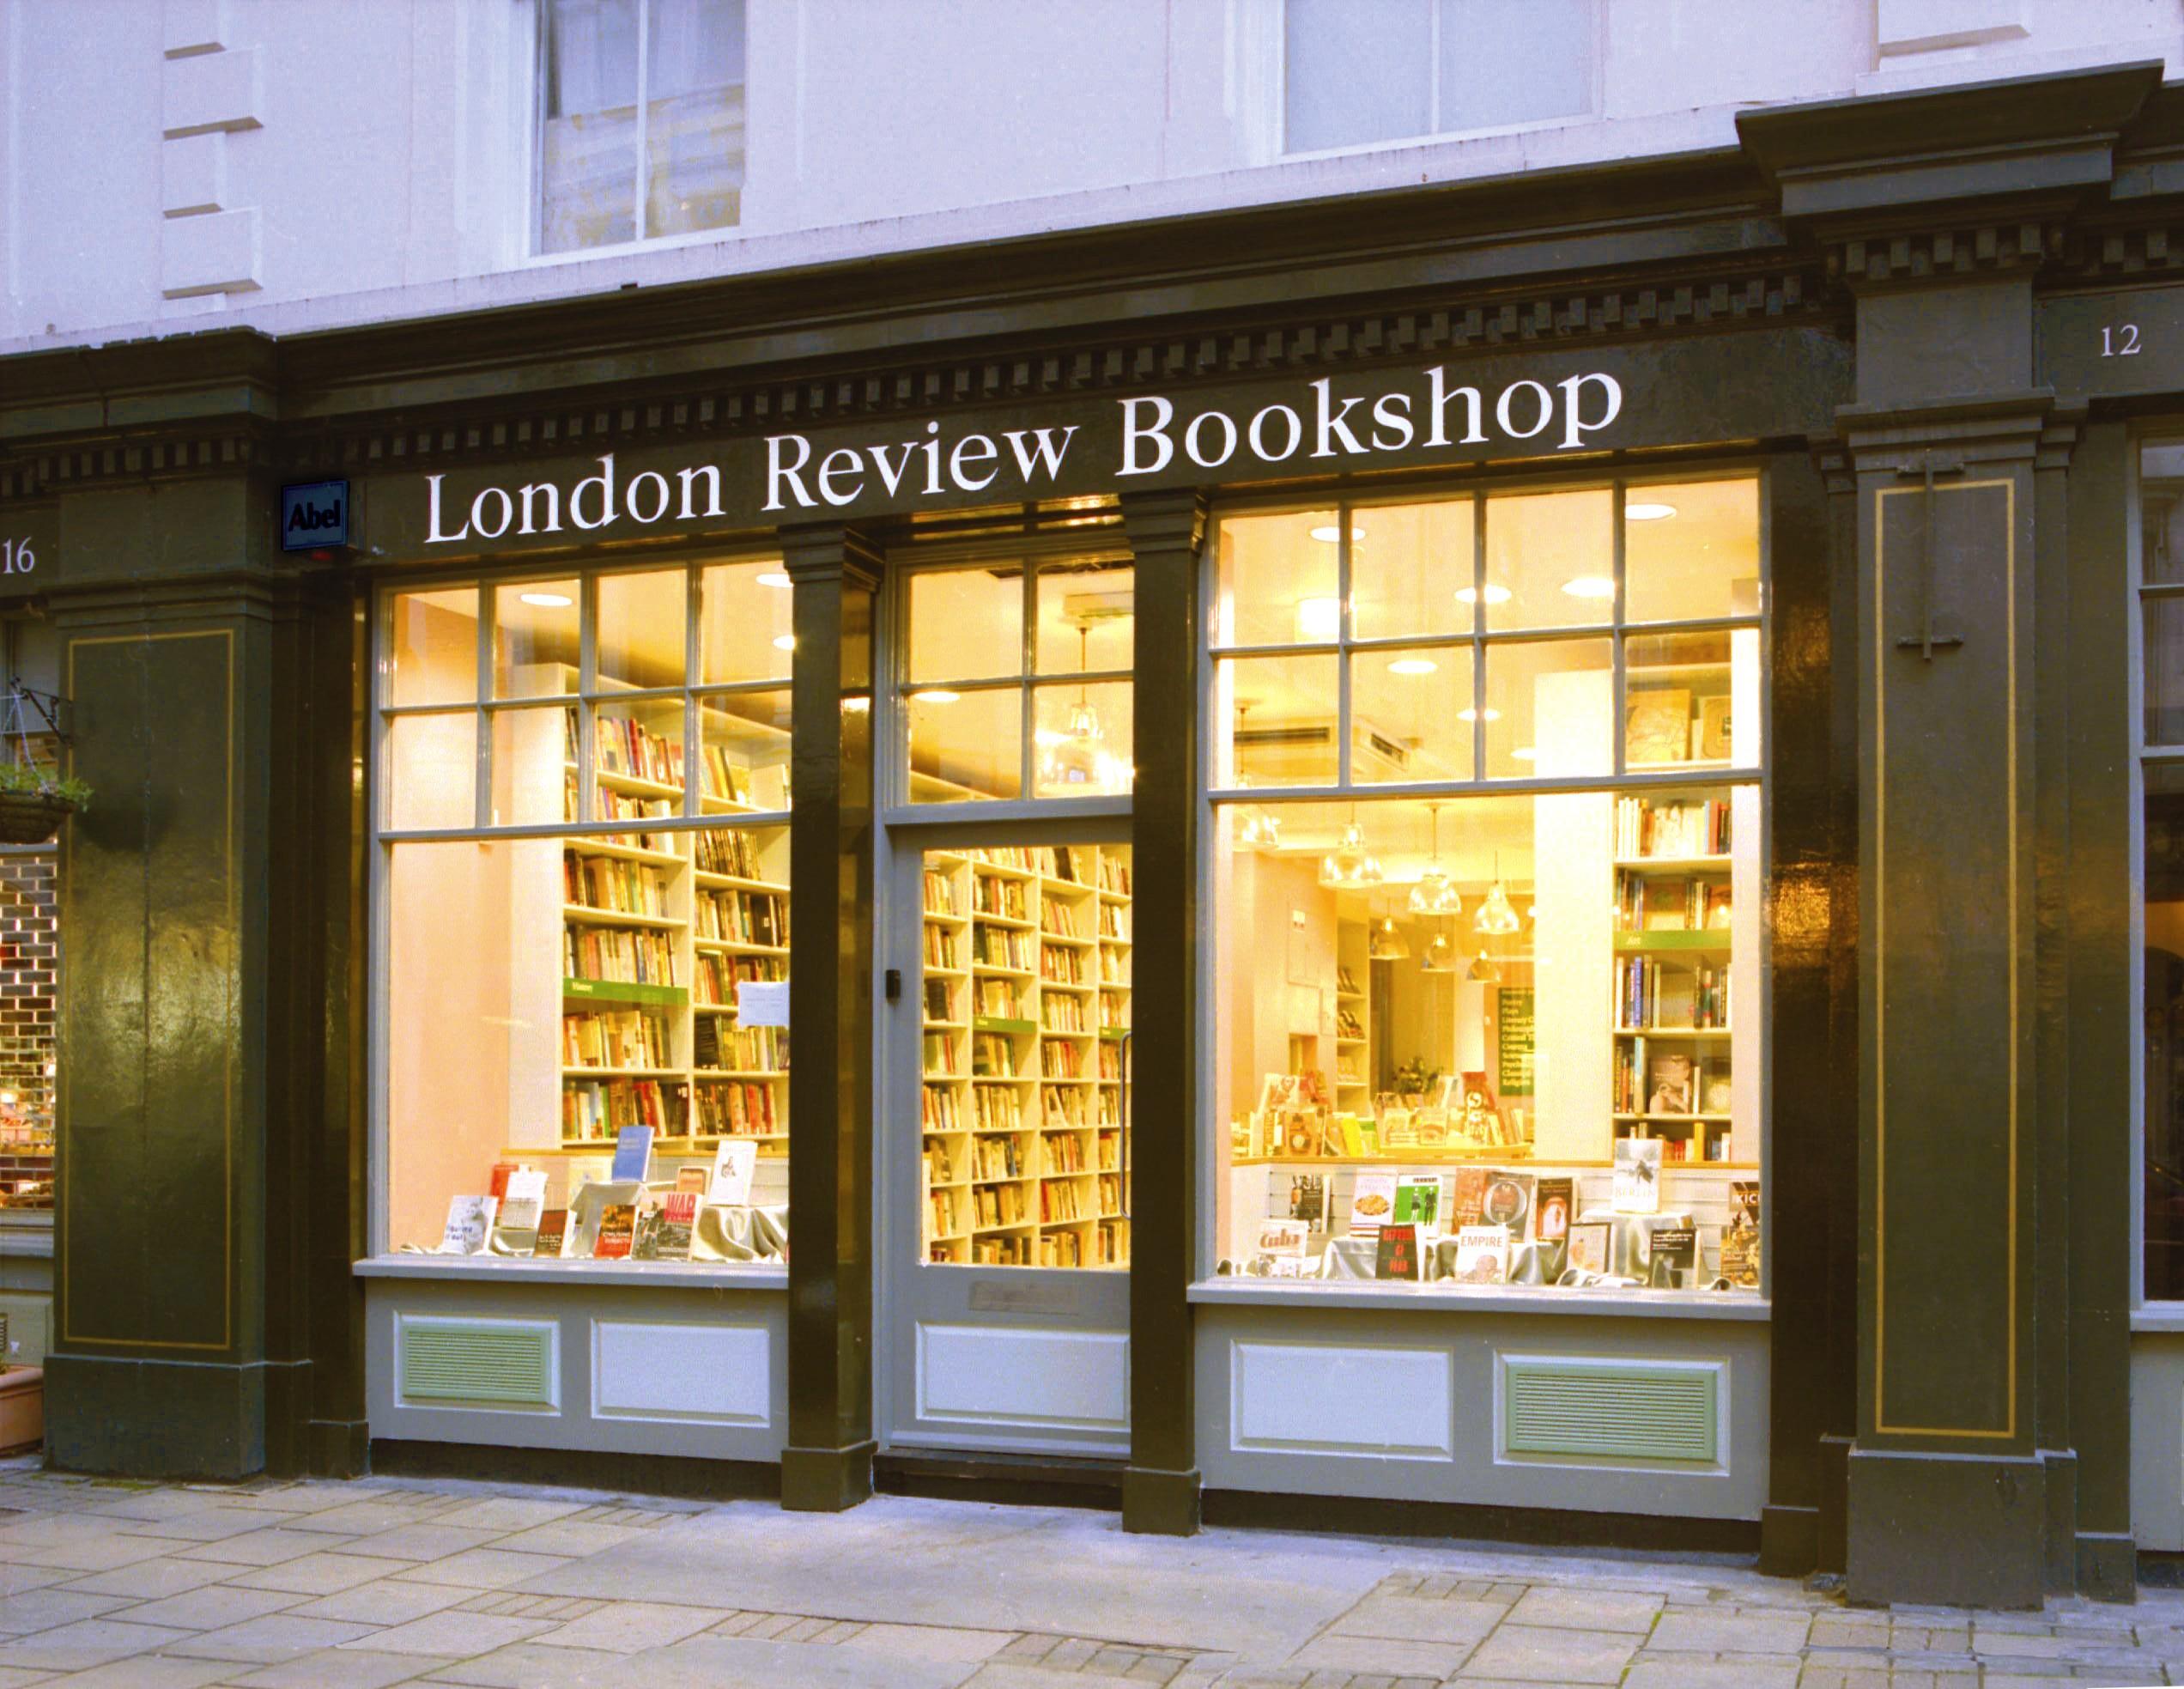 the bookshop - photo #34